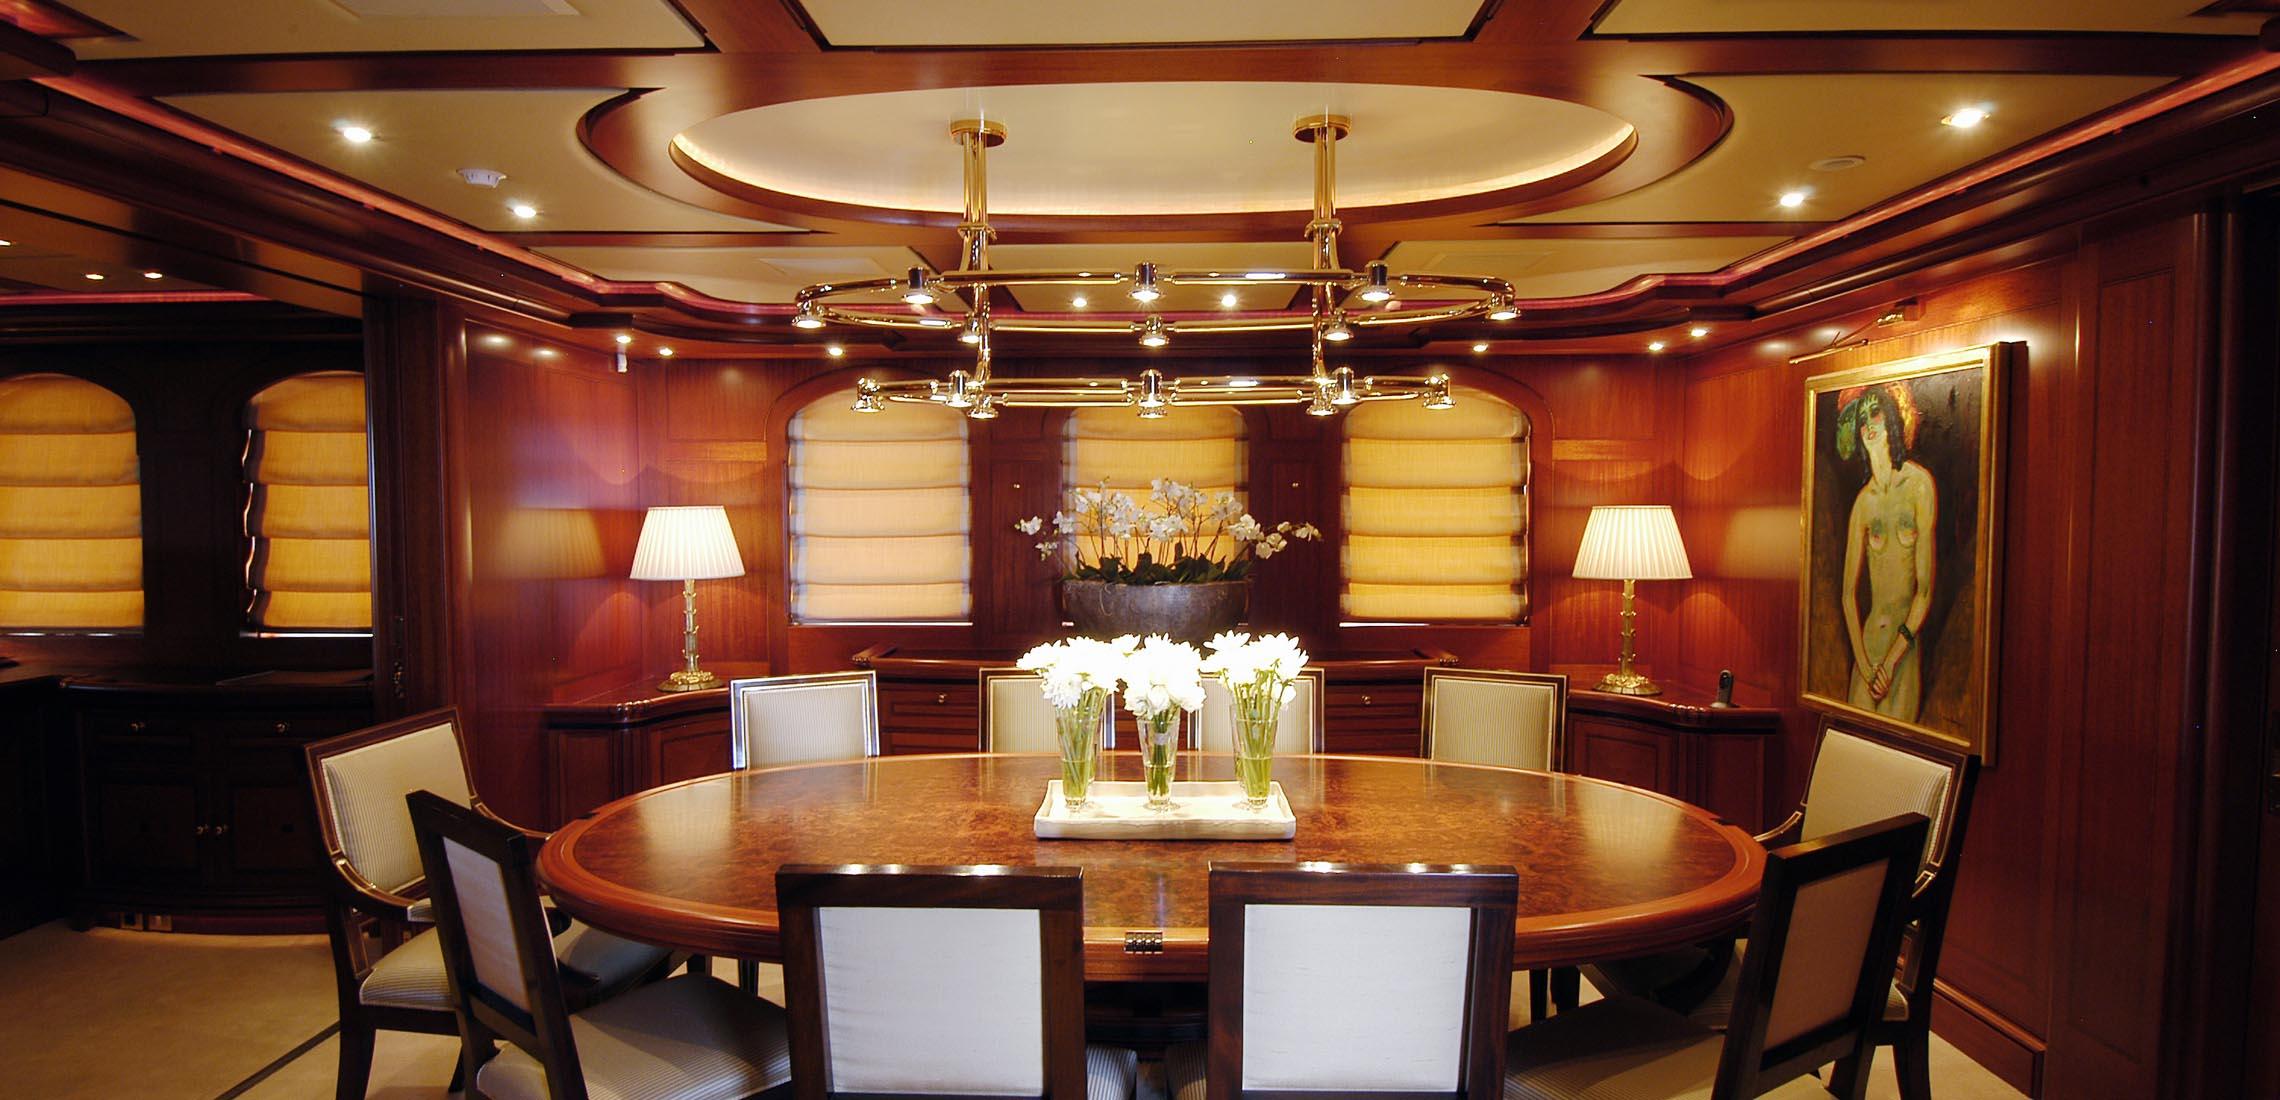 Indoor Dining - Formal